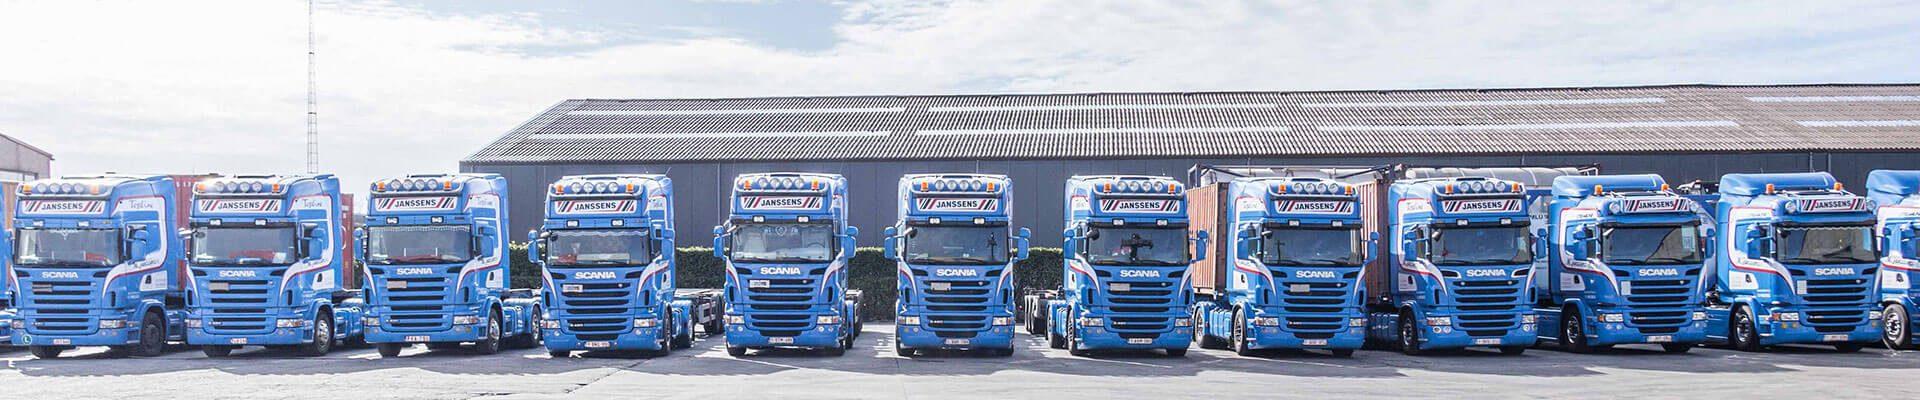 vrachtwagen transportbedrijf